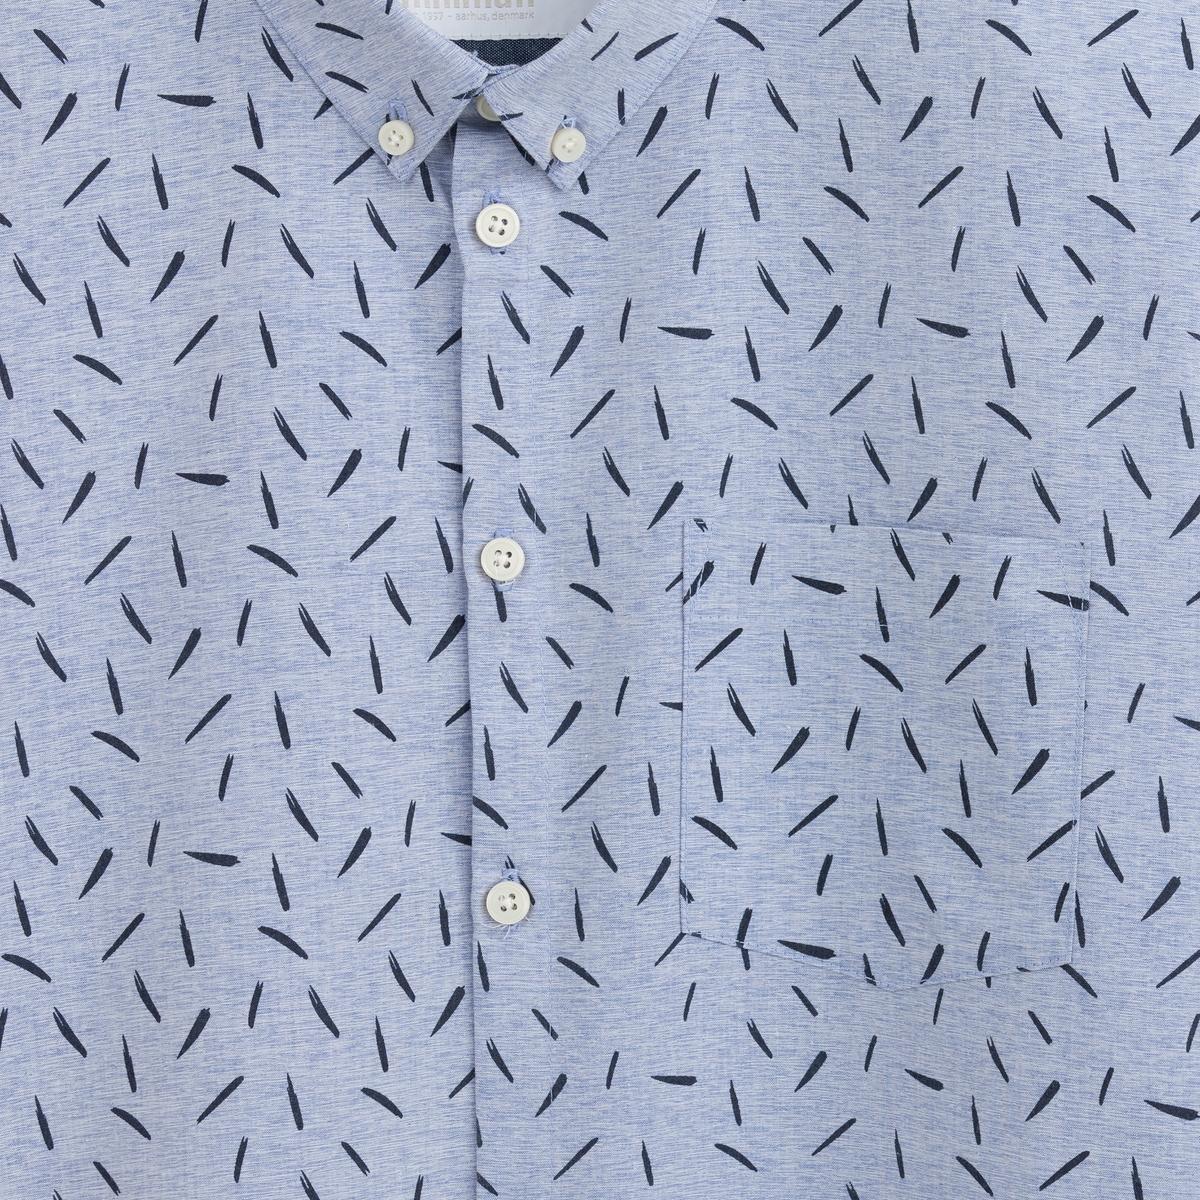 РубашкаРубашка MINIMUM.Рубашка MINIMUM100% хлопка. Края воротника на пуговицах. Длинные рукава.<br><br>Цвет: синий<br>Размер: S